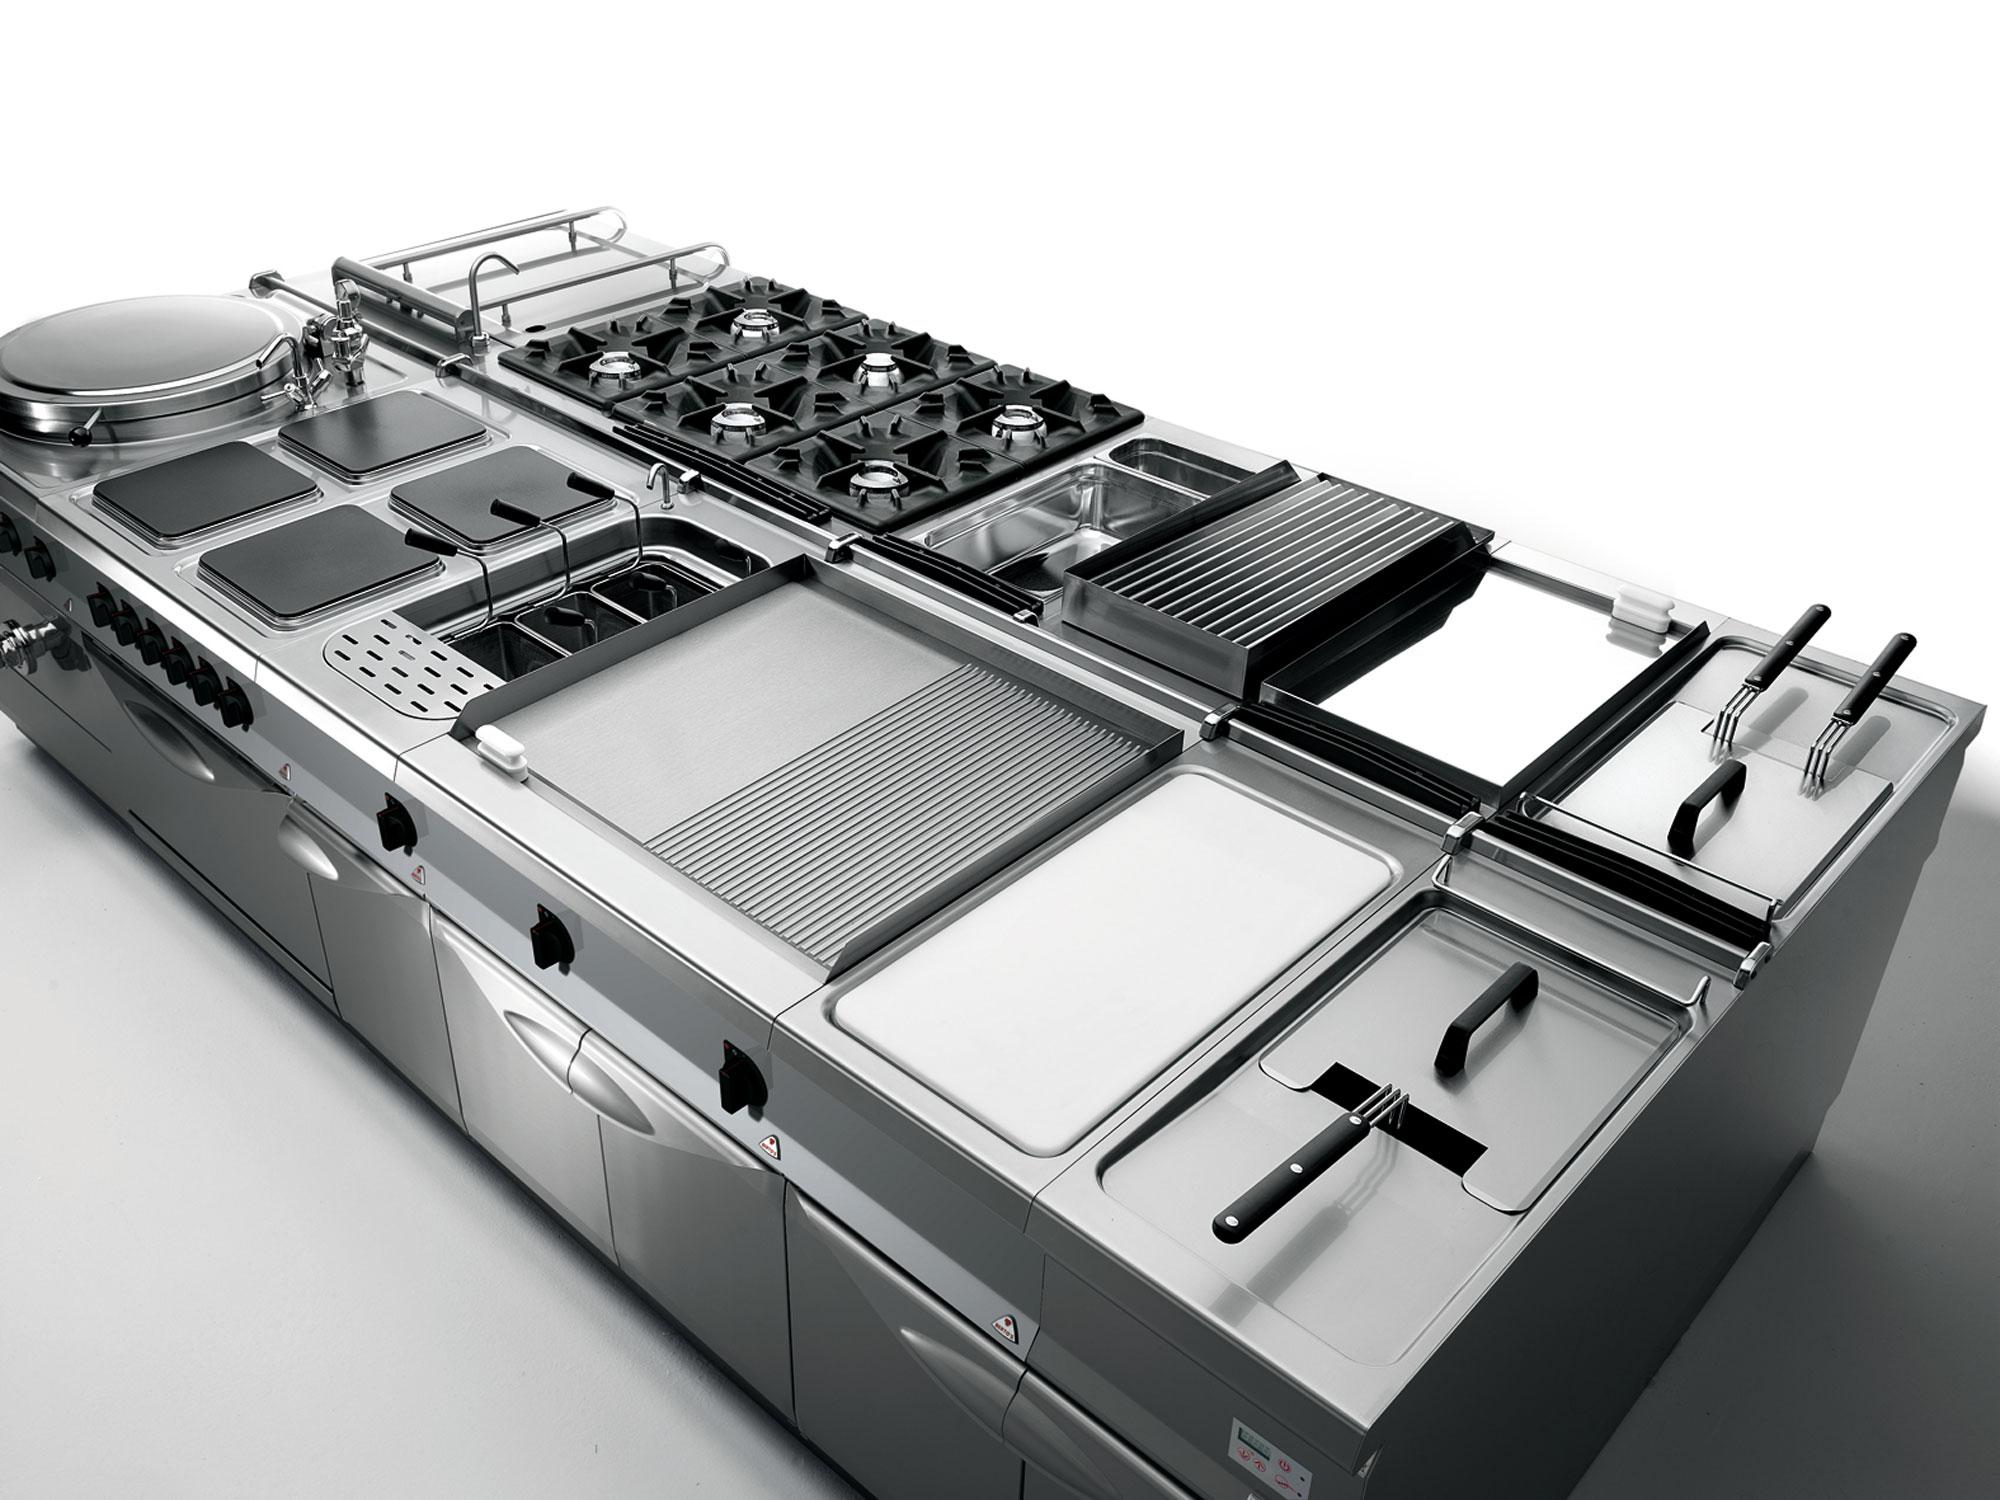 Banchi frigo izzi arredamenti for Ceppi arredamenti